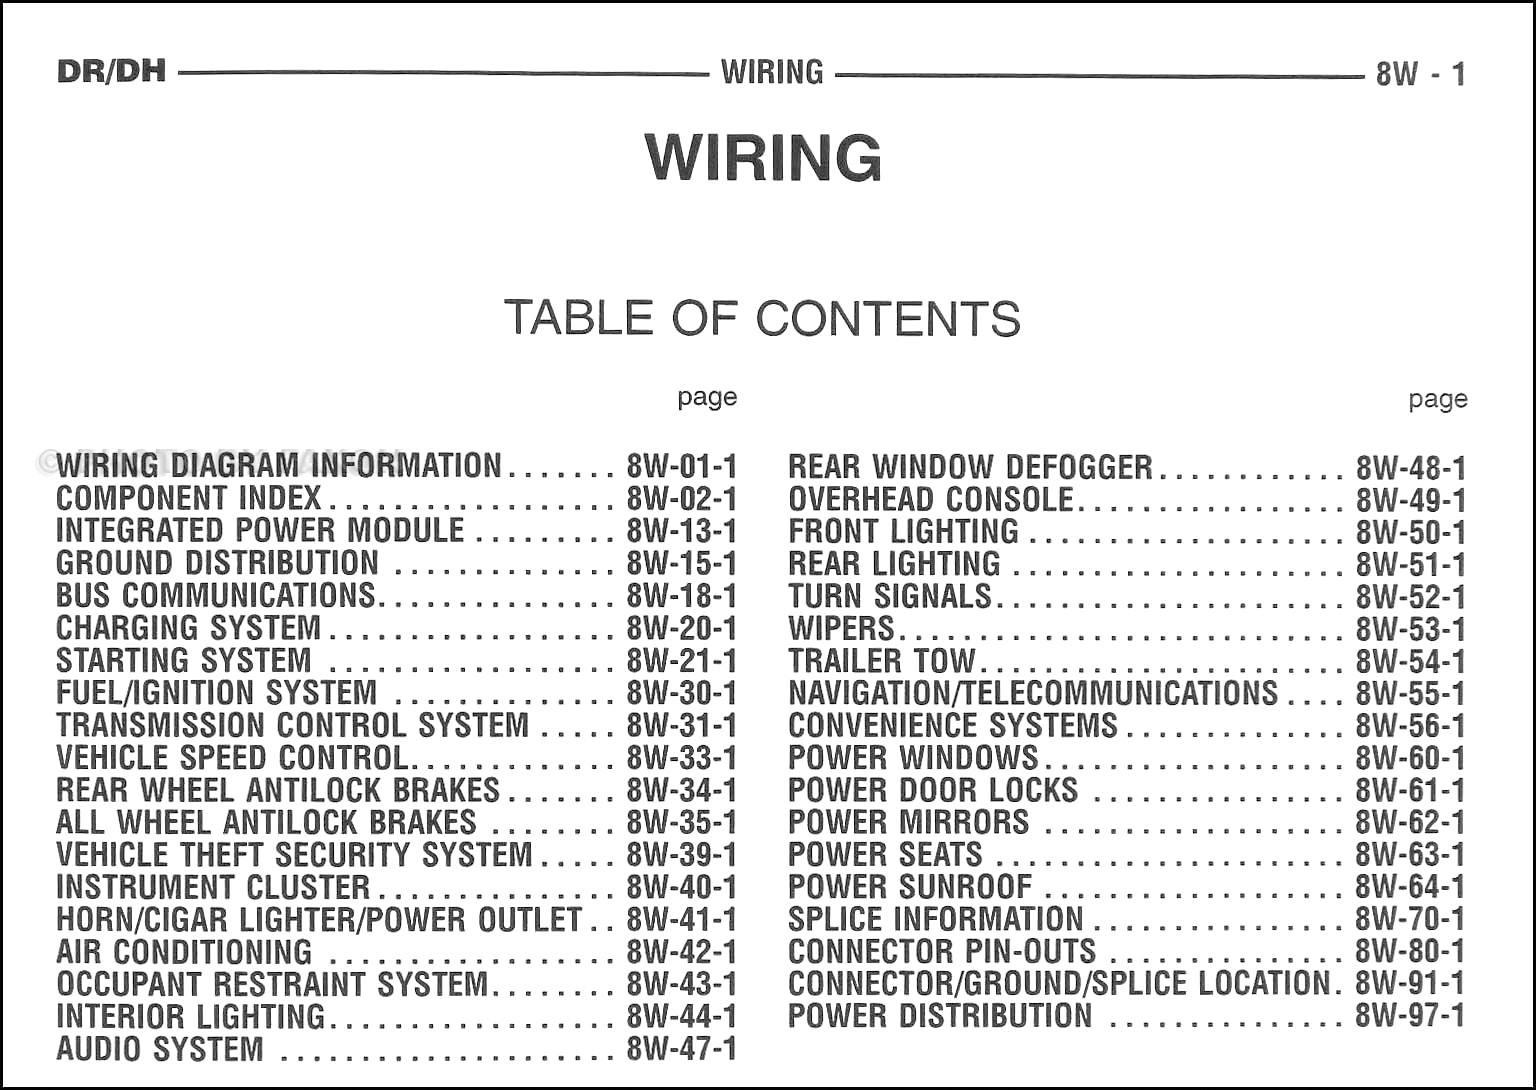 2001 Dodge Ram Radio Wiring Diagram Download New - Allove - 2001 Dodge Ram Radio Wiring Diagram